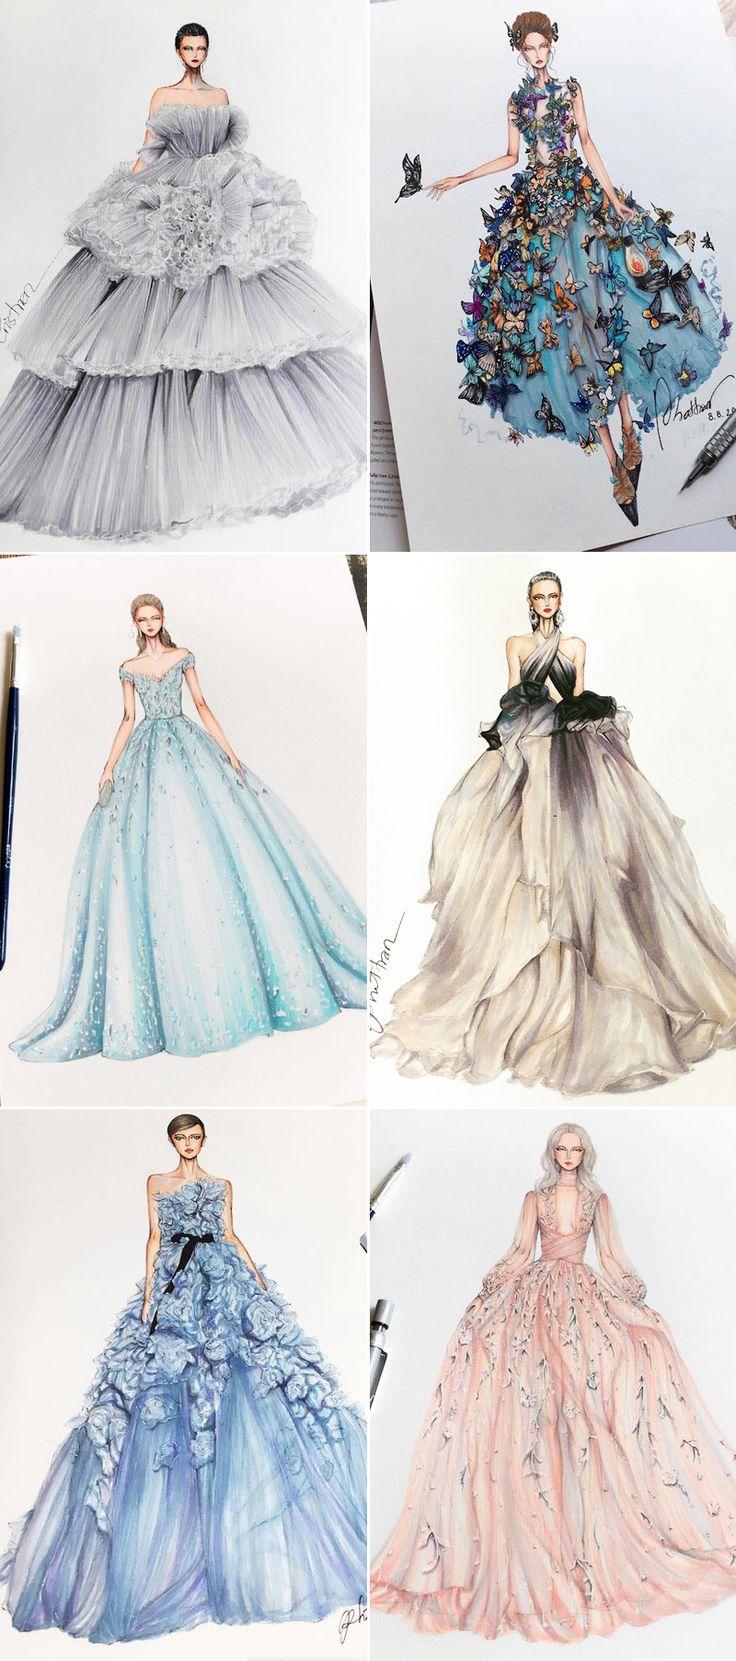 Fashion Illustration05-ErisTran